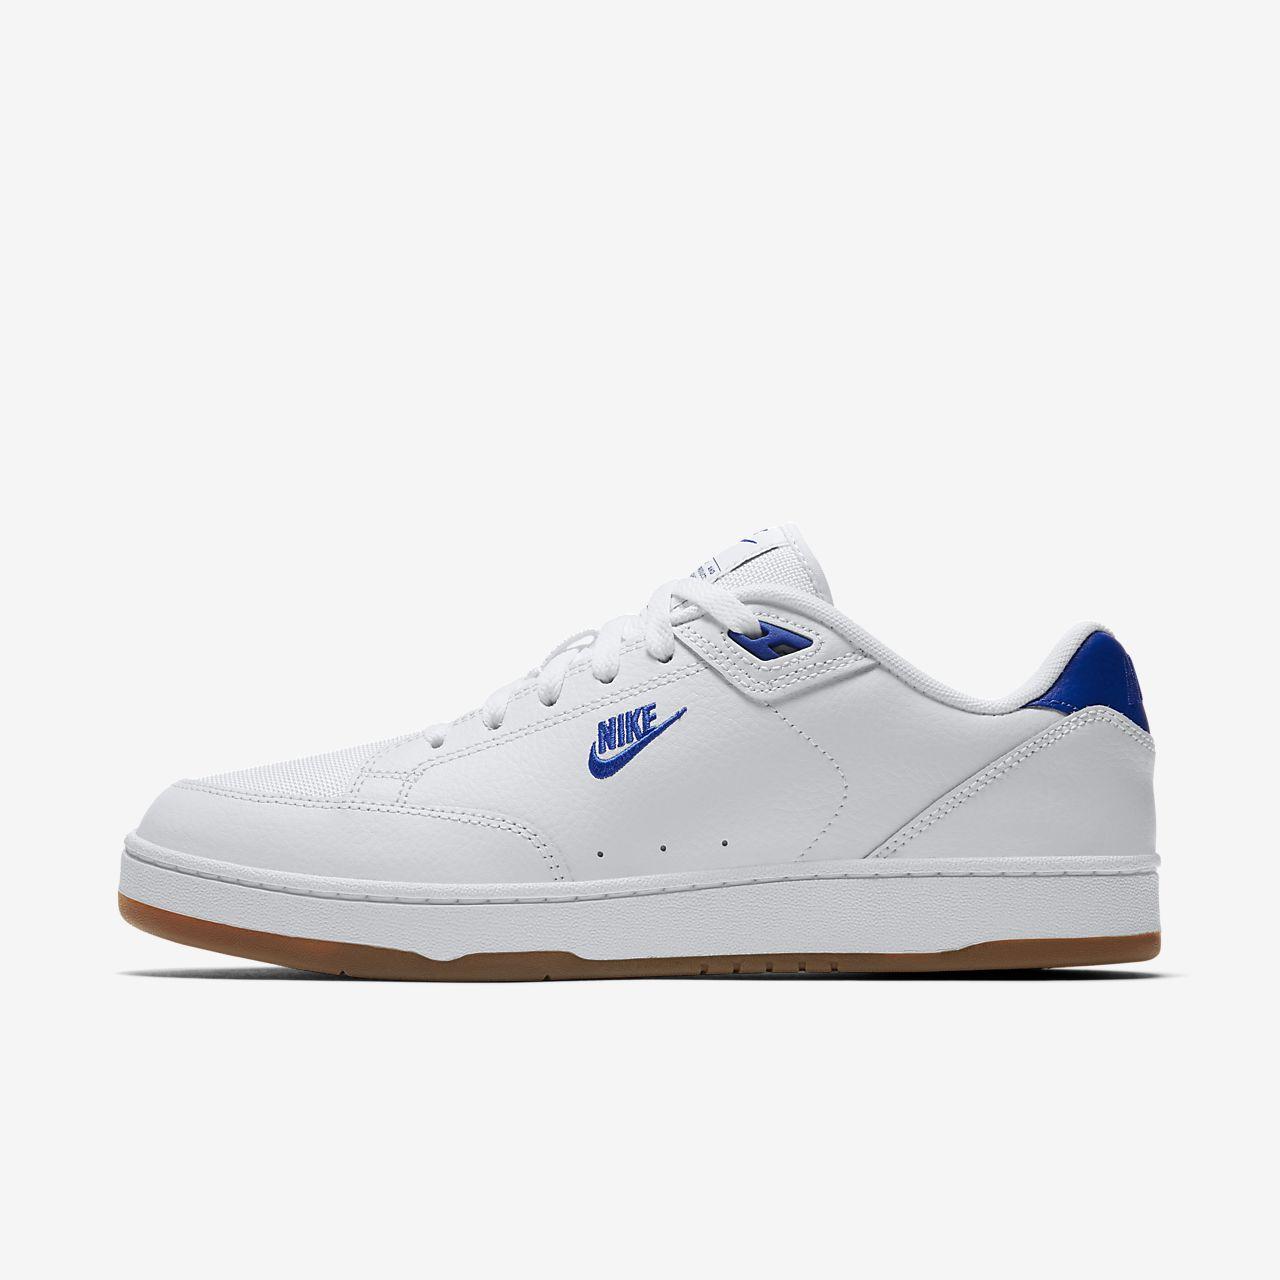 new styles e5471 ed462 ... Nike Grandstand II Premium-sko til mænd